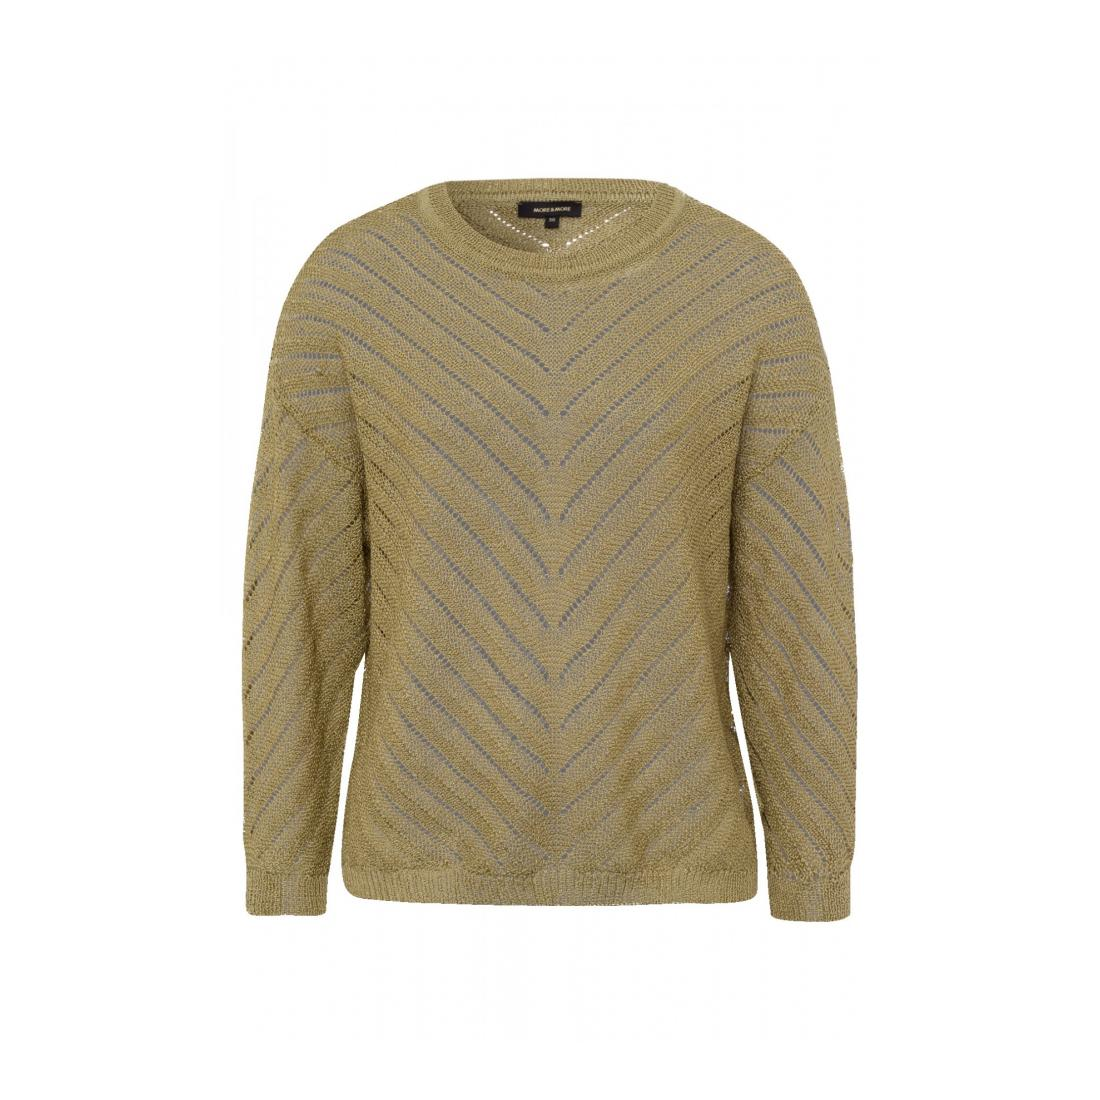 More & More Pullover Damen Pullover w special struct